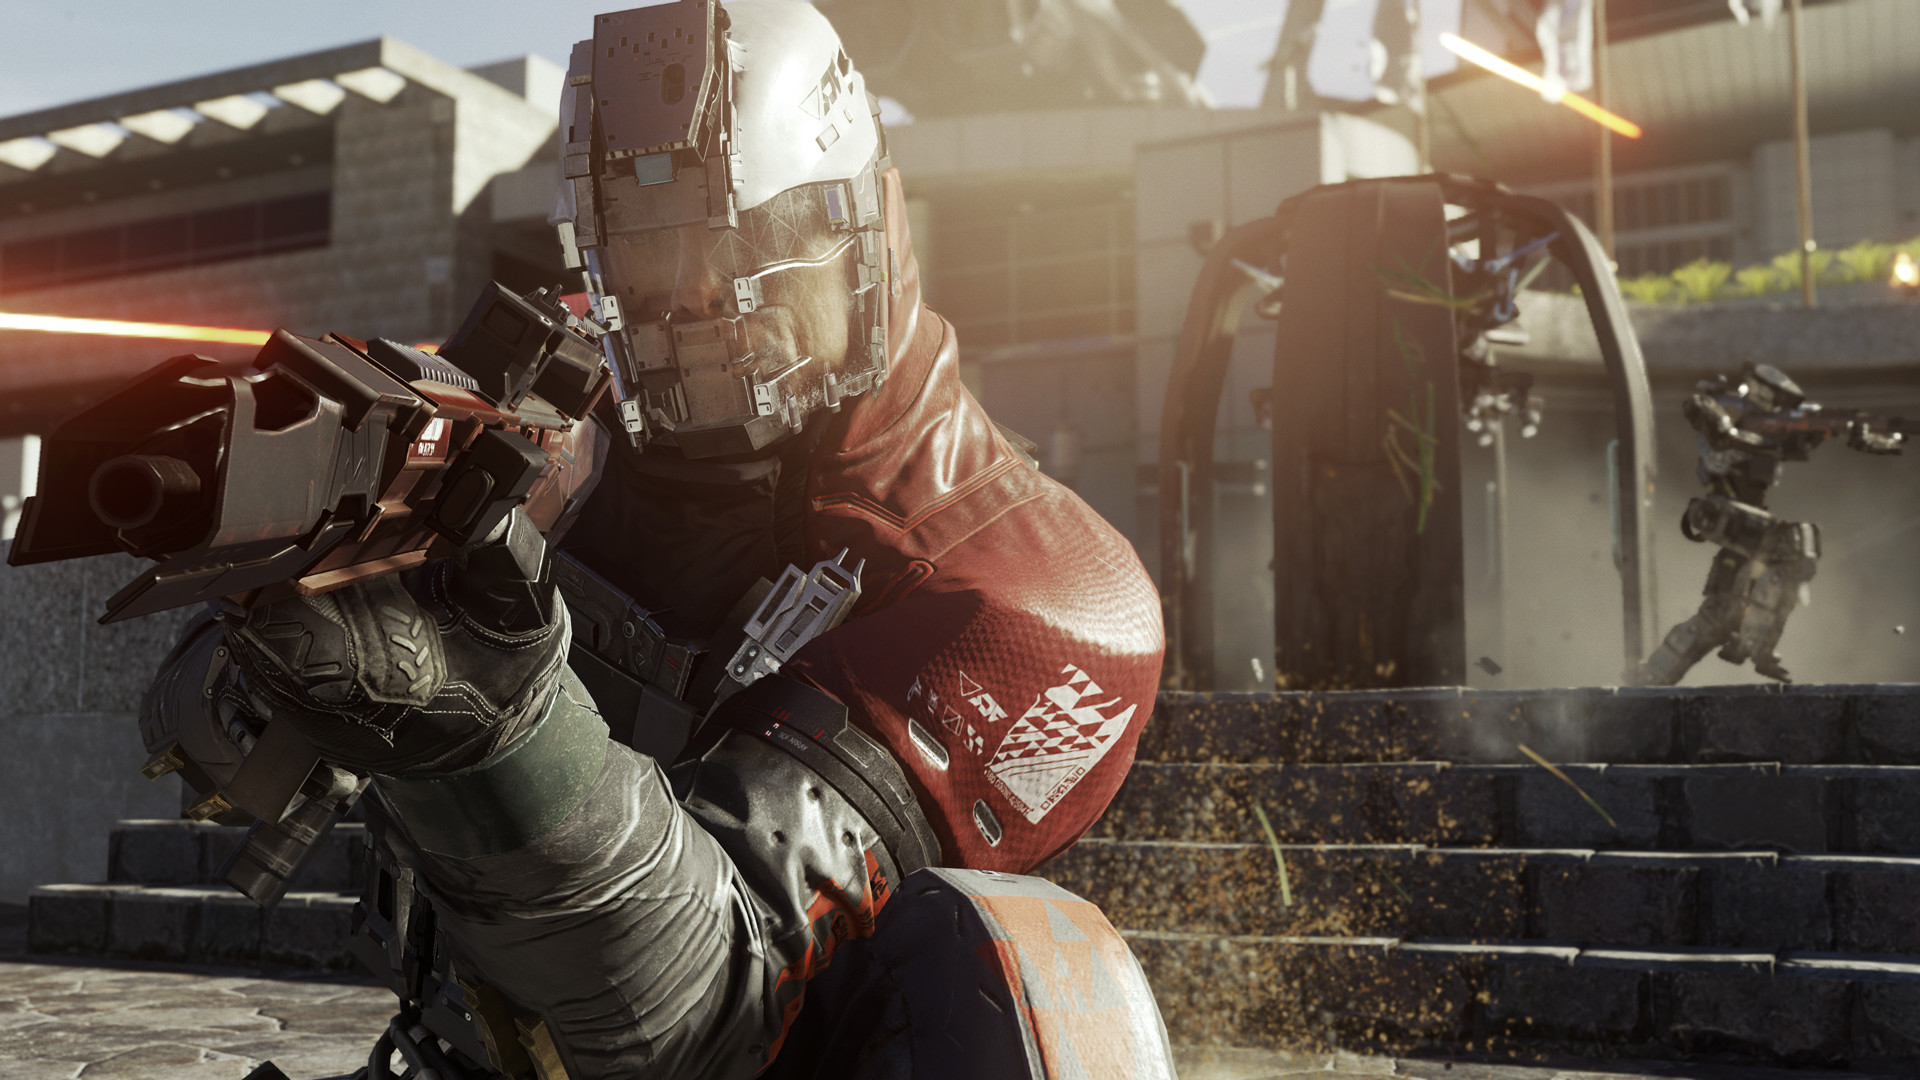 Call Of Duty Infinite Warfare ESPAÑOL Descargar Full + Update v20161118 (RELOADED) + REPACK 11 DVD5 (JPW) 3